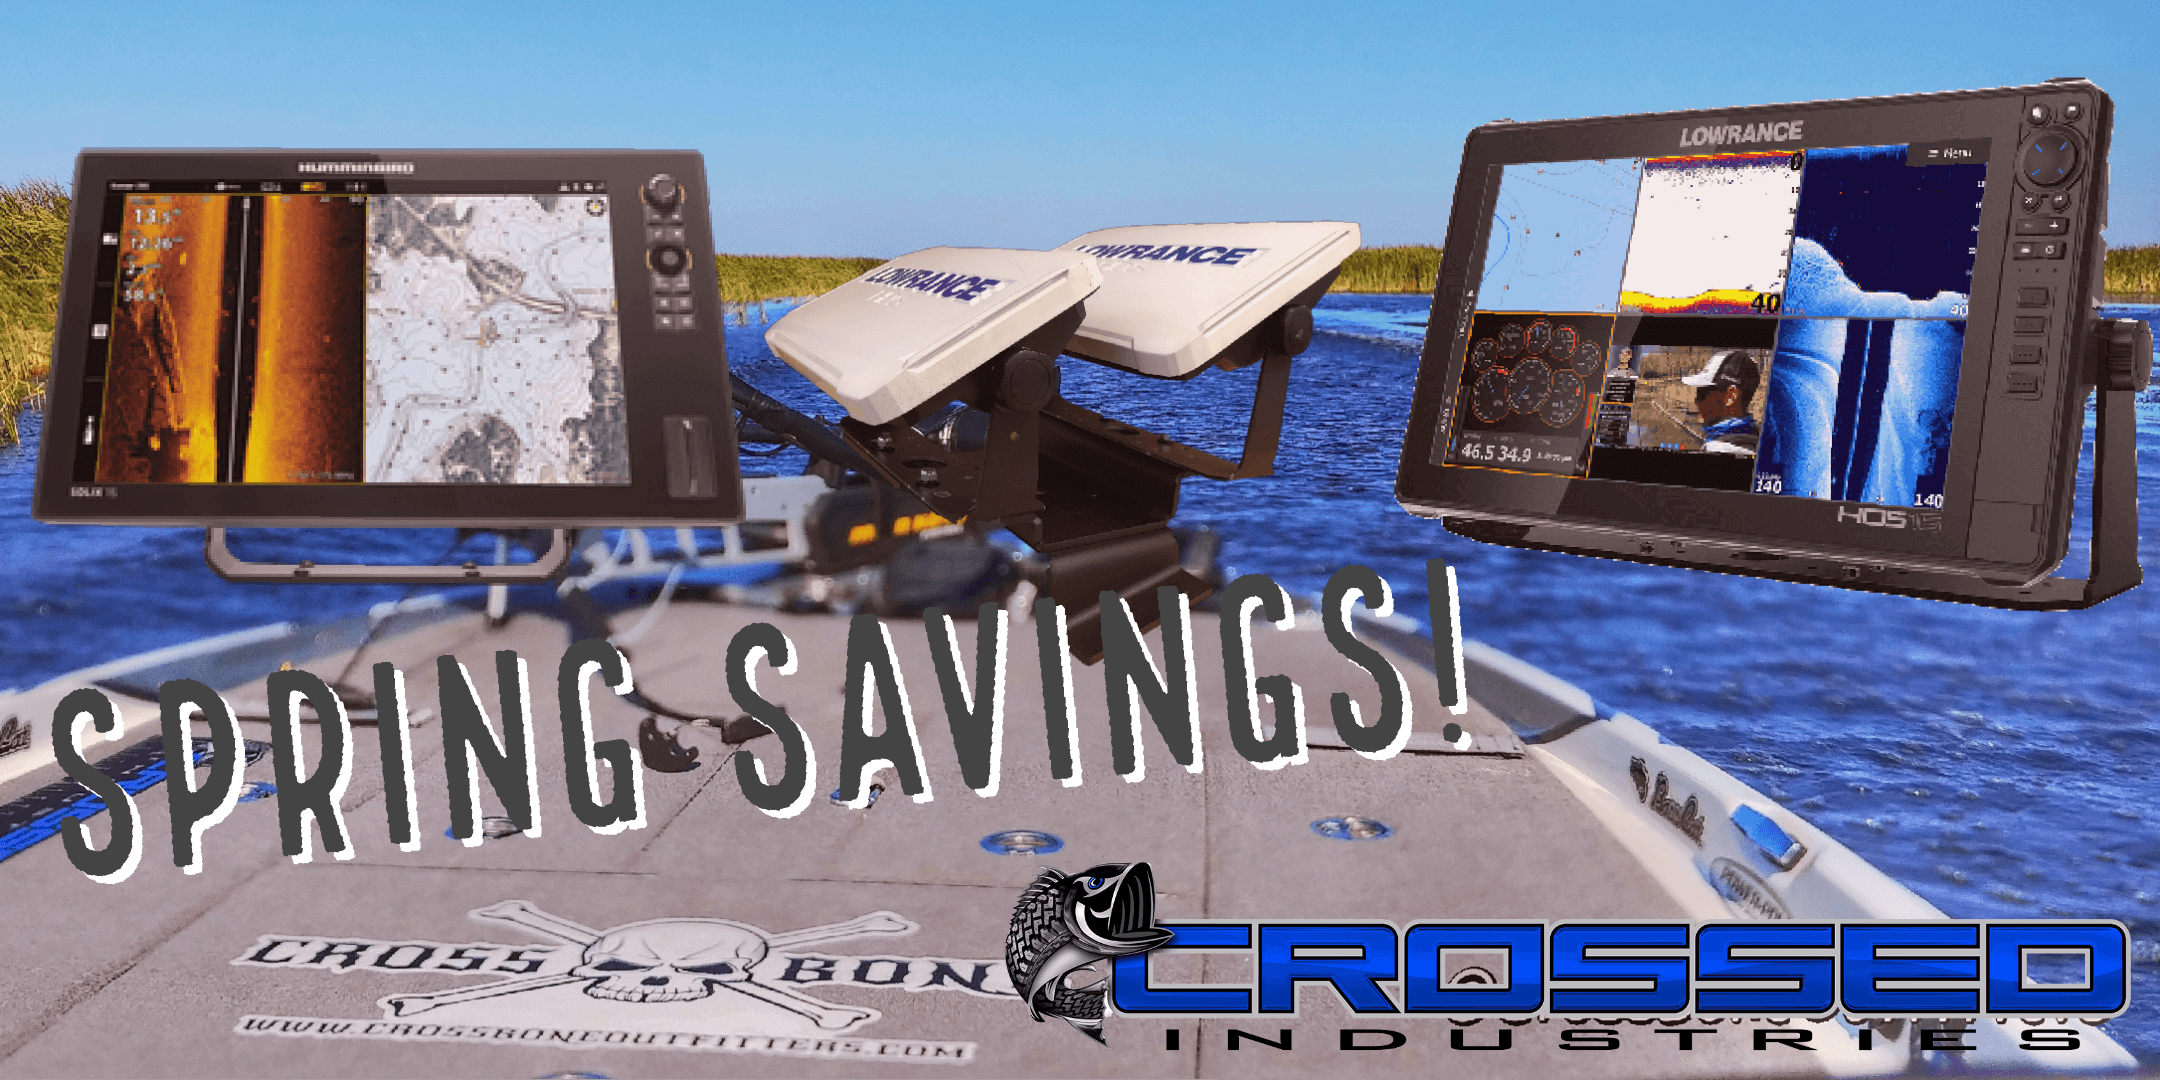 Spring Savings! - Adobe Post 20190420 170207